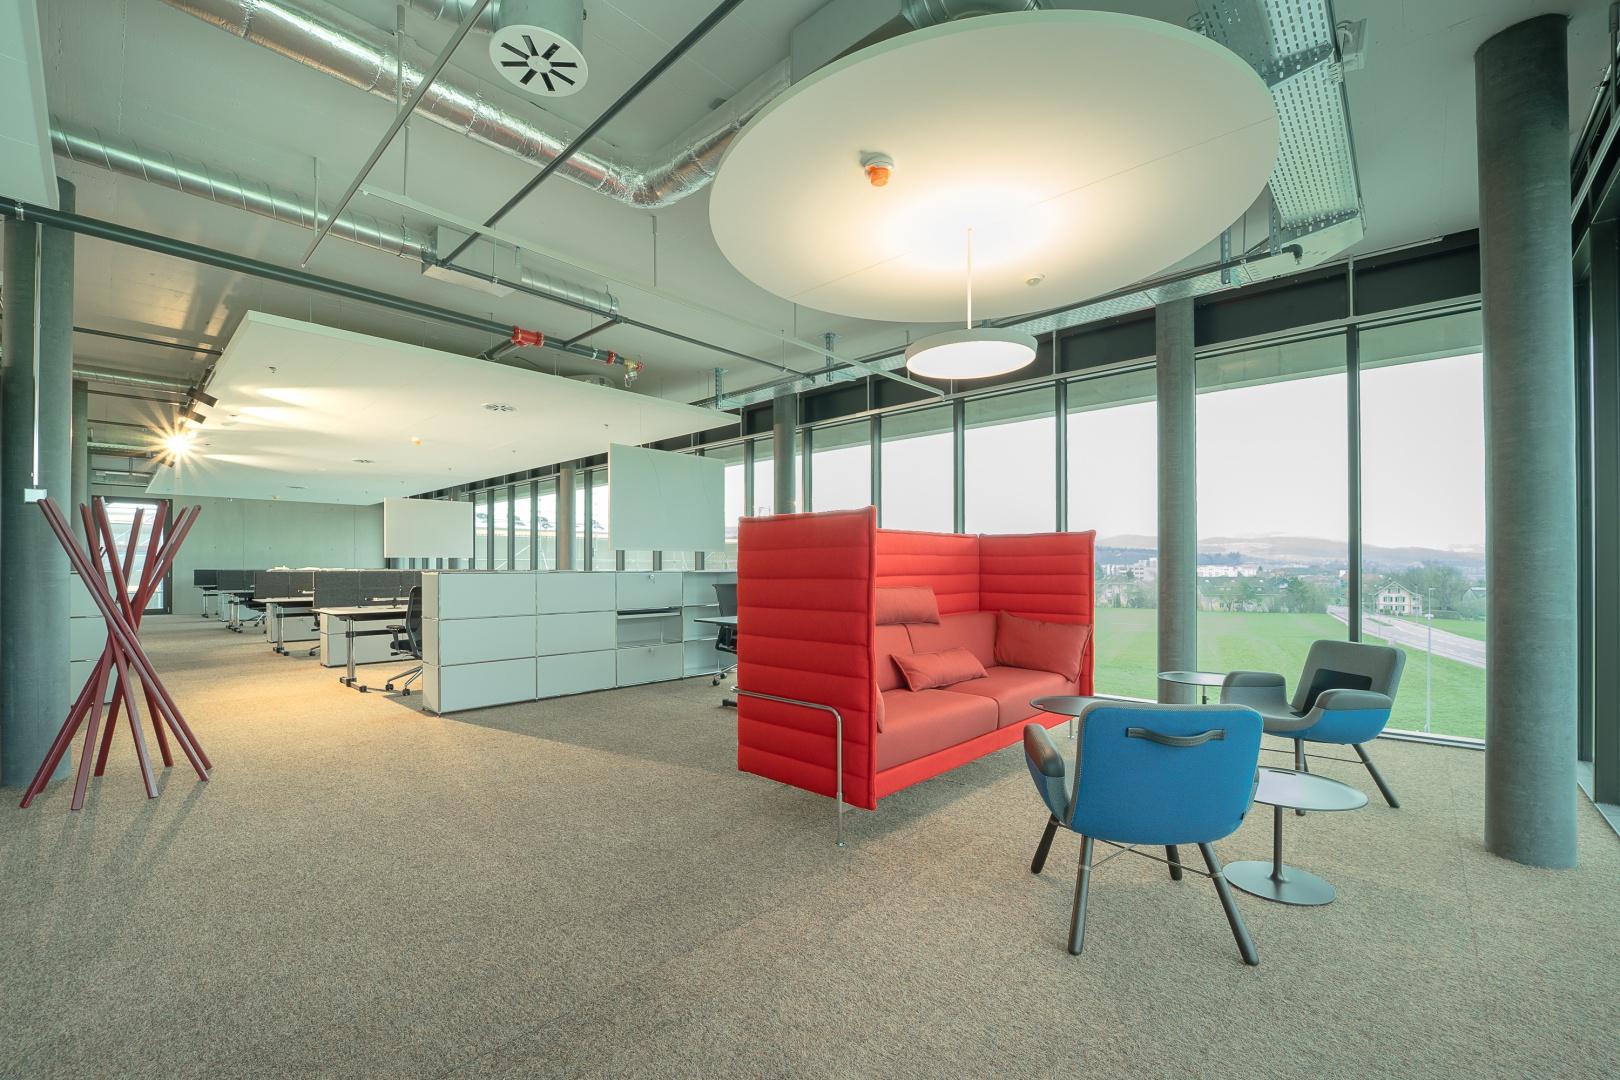 Büro mit Besprechungsecke © Marianne Spichiger